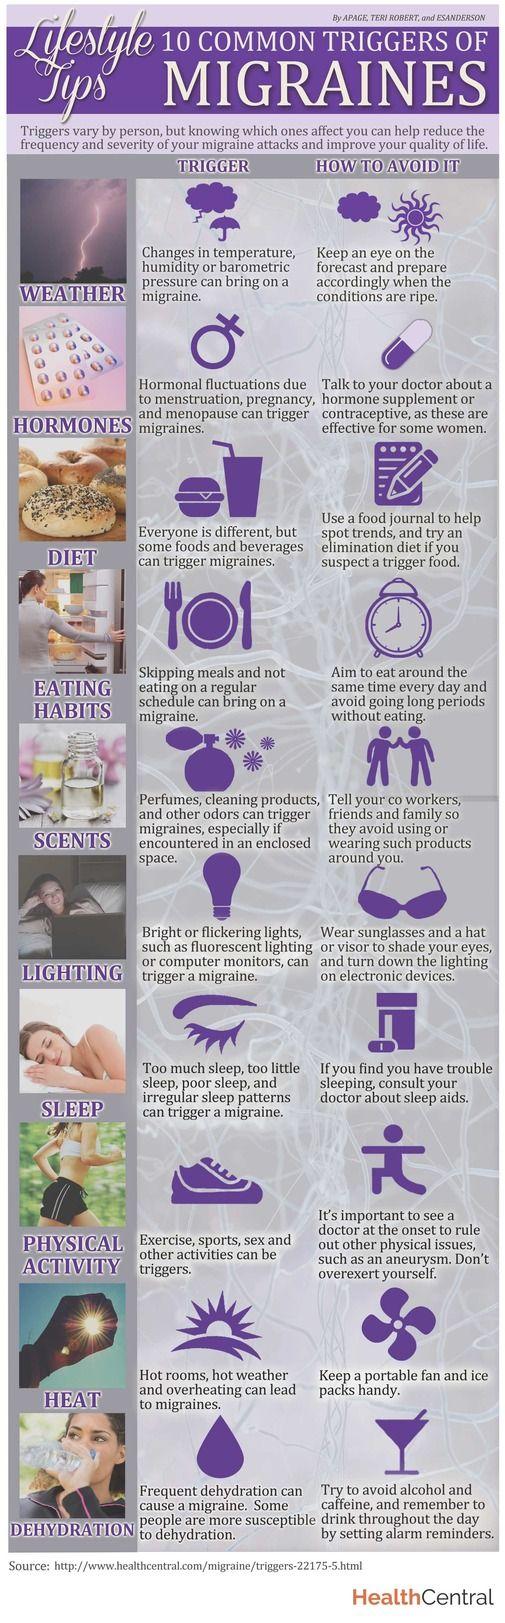 10 Common Migraine Triggers - Migraine